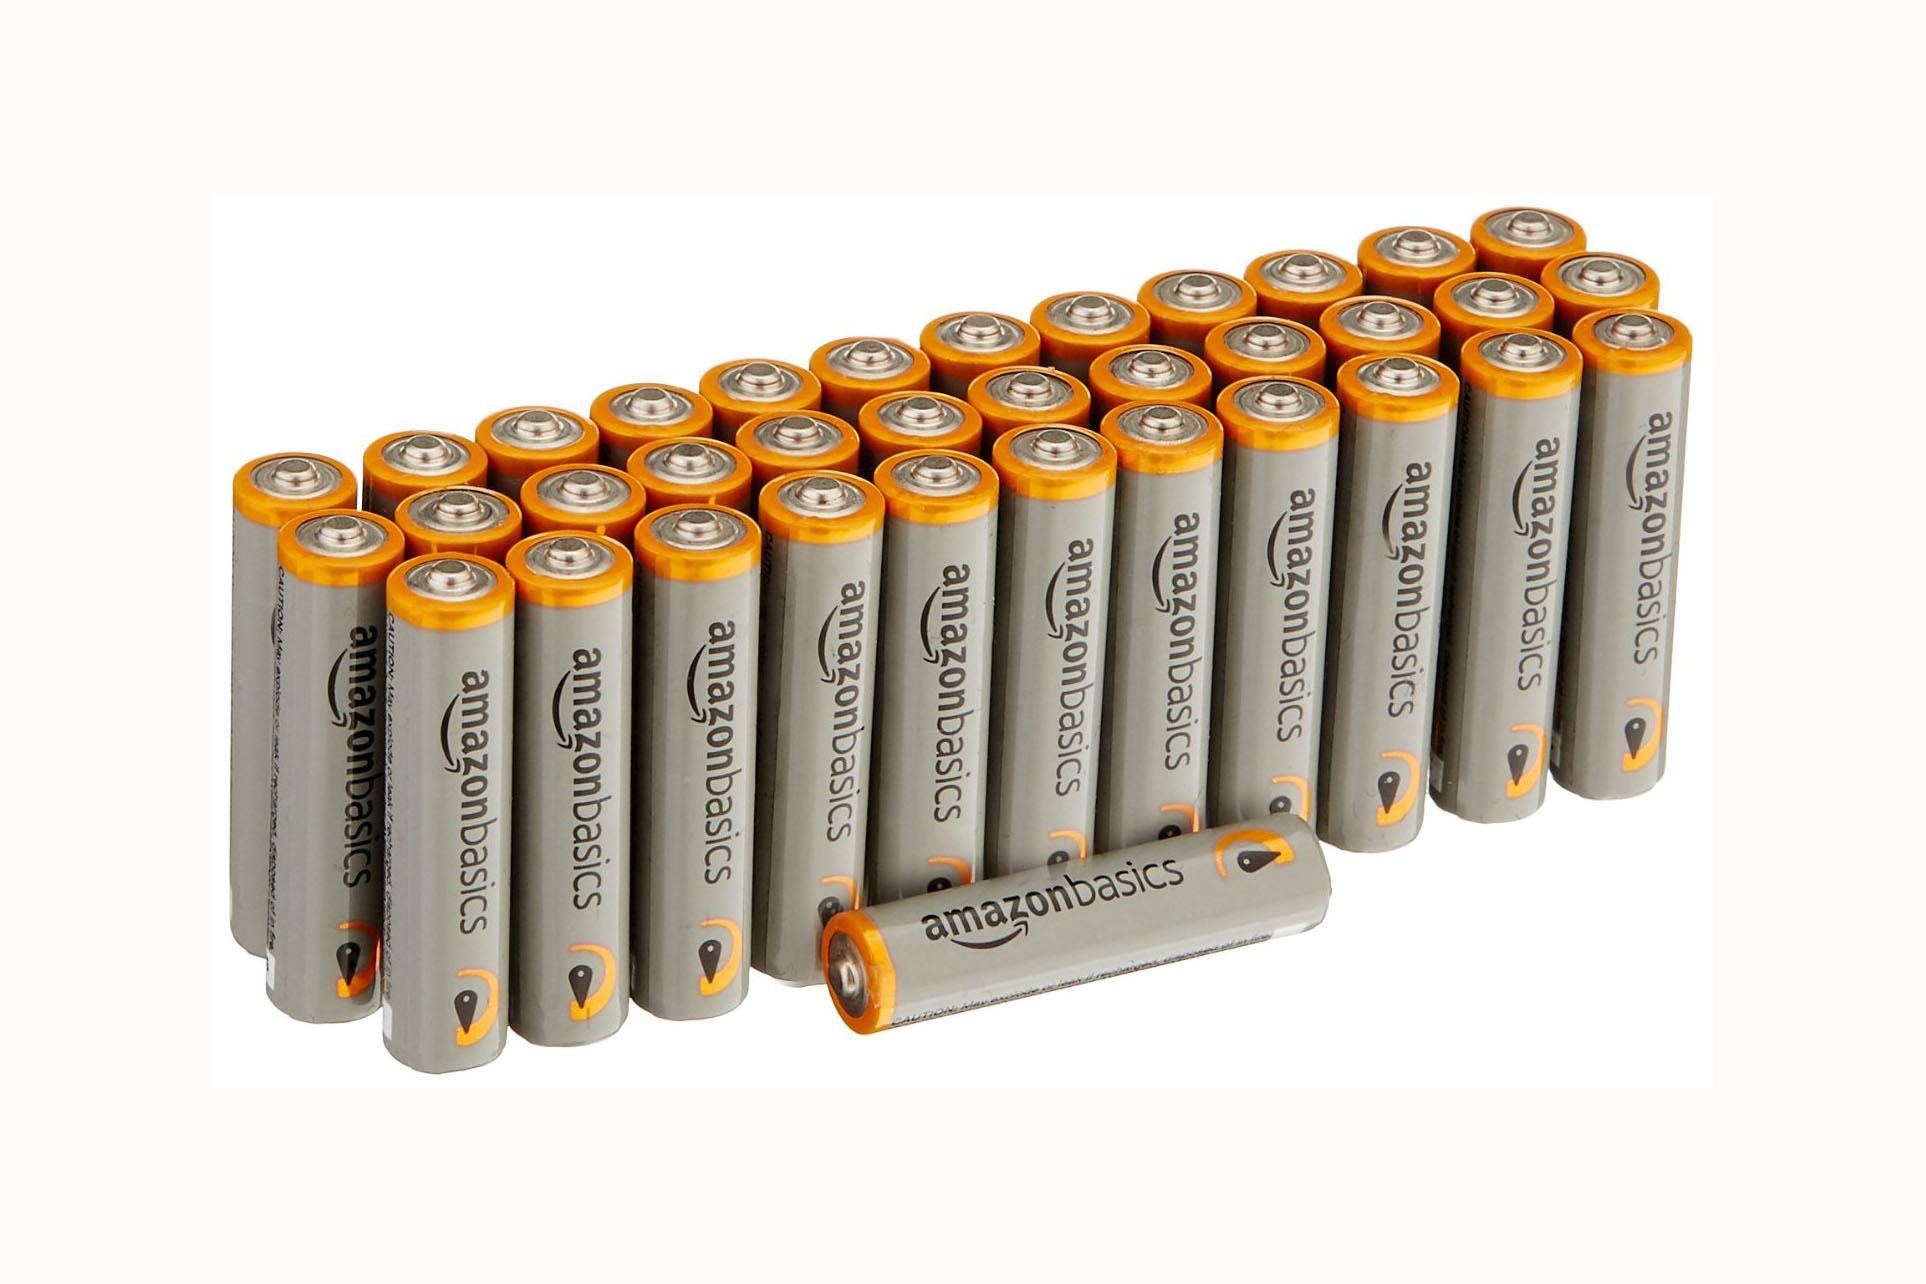 36 Pack - AAA Batteries - 4.5 stars - $11 (Prime)